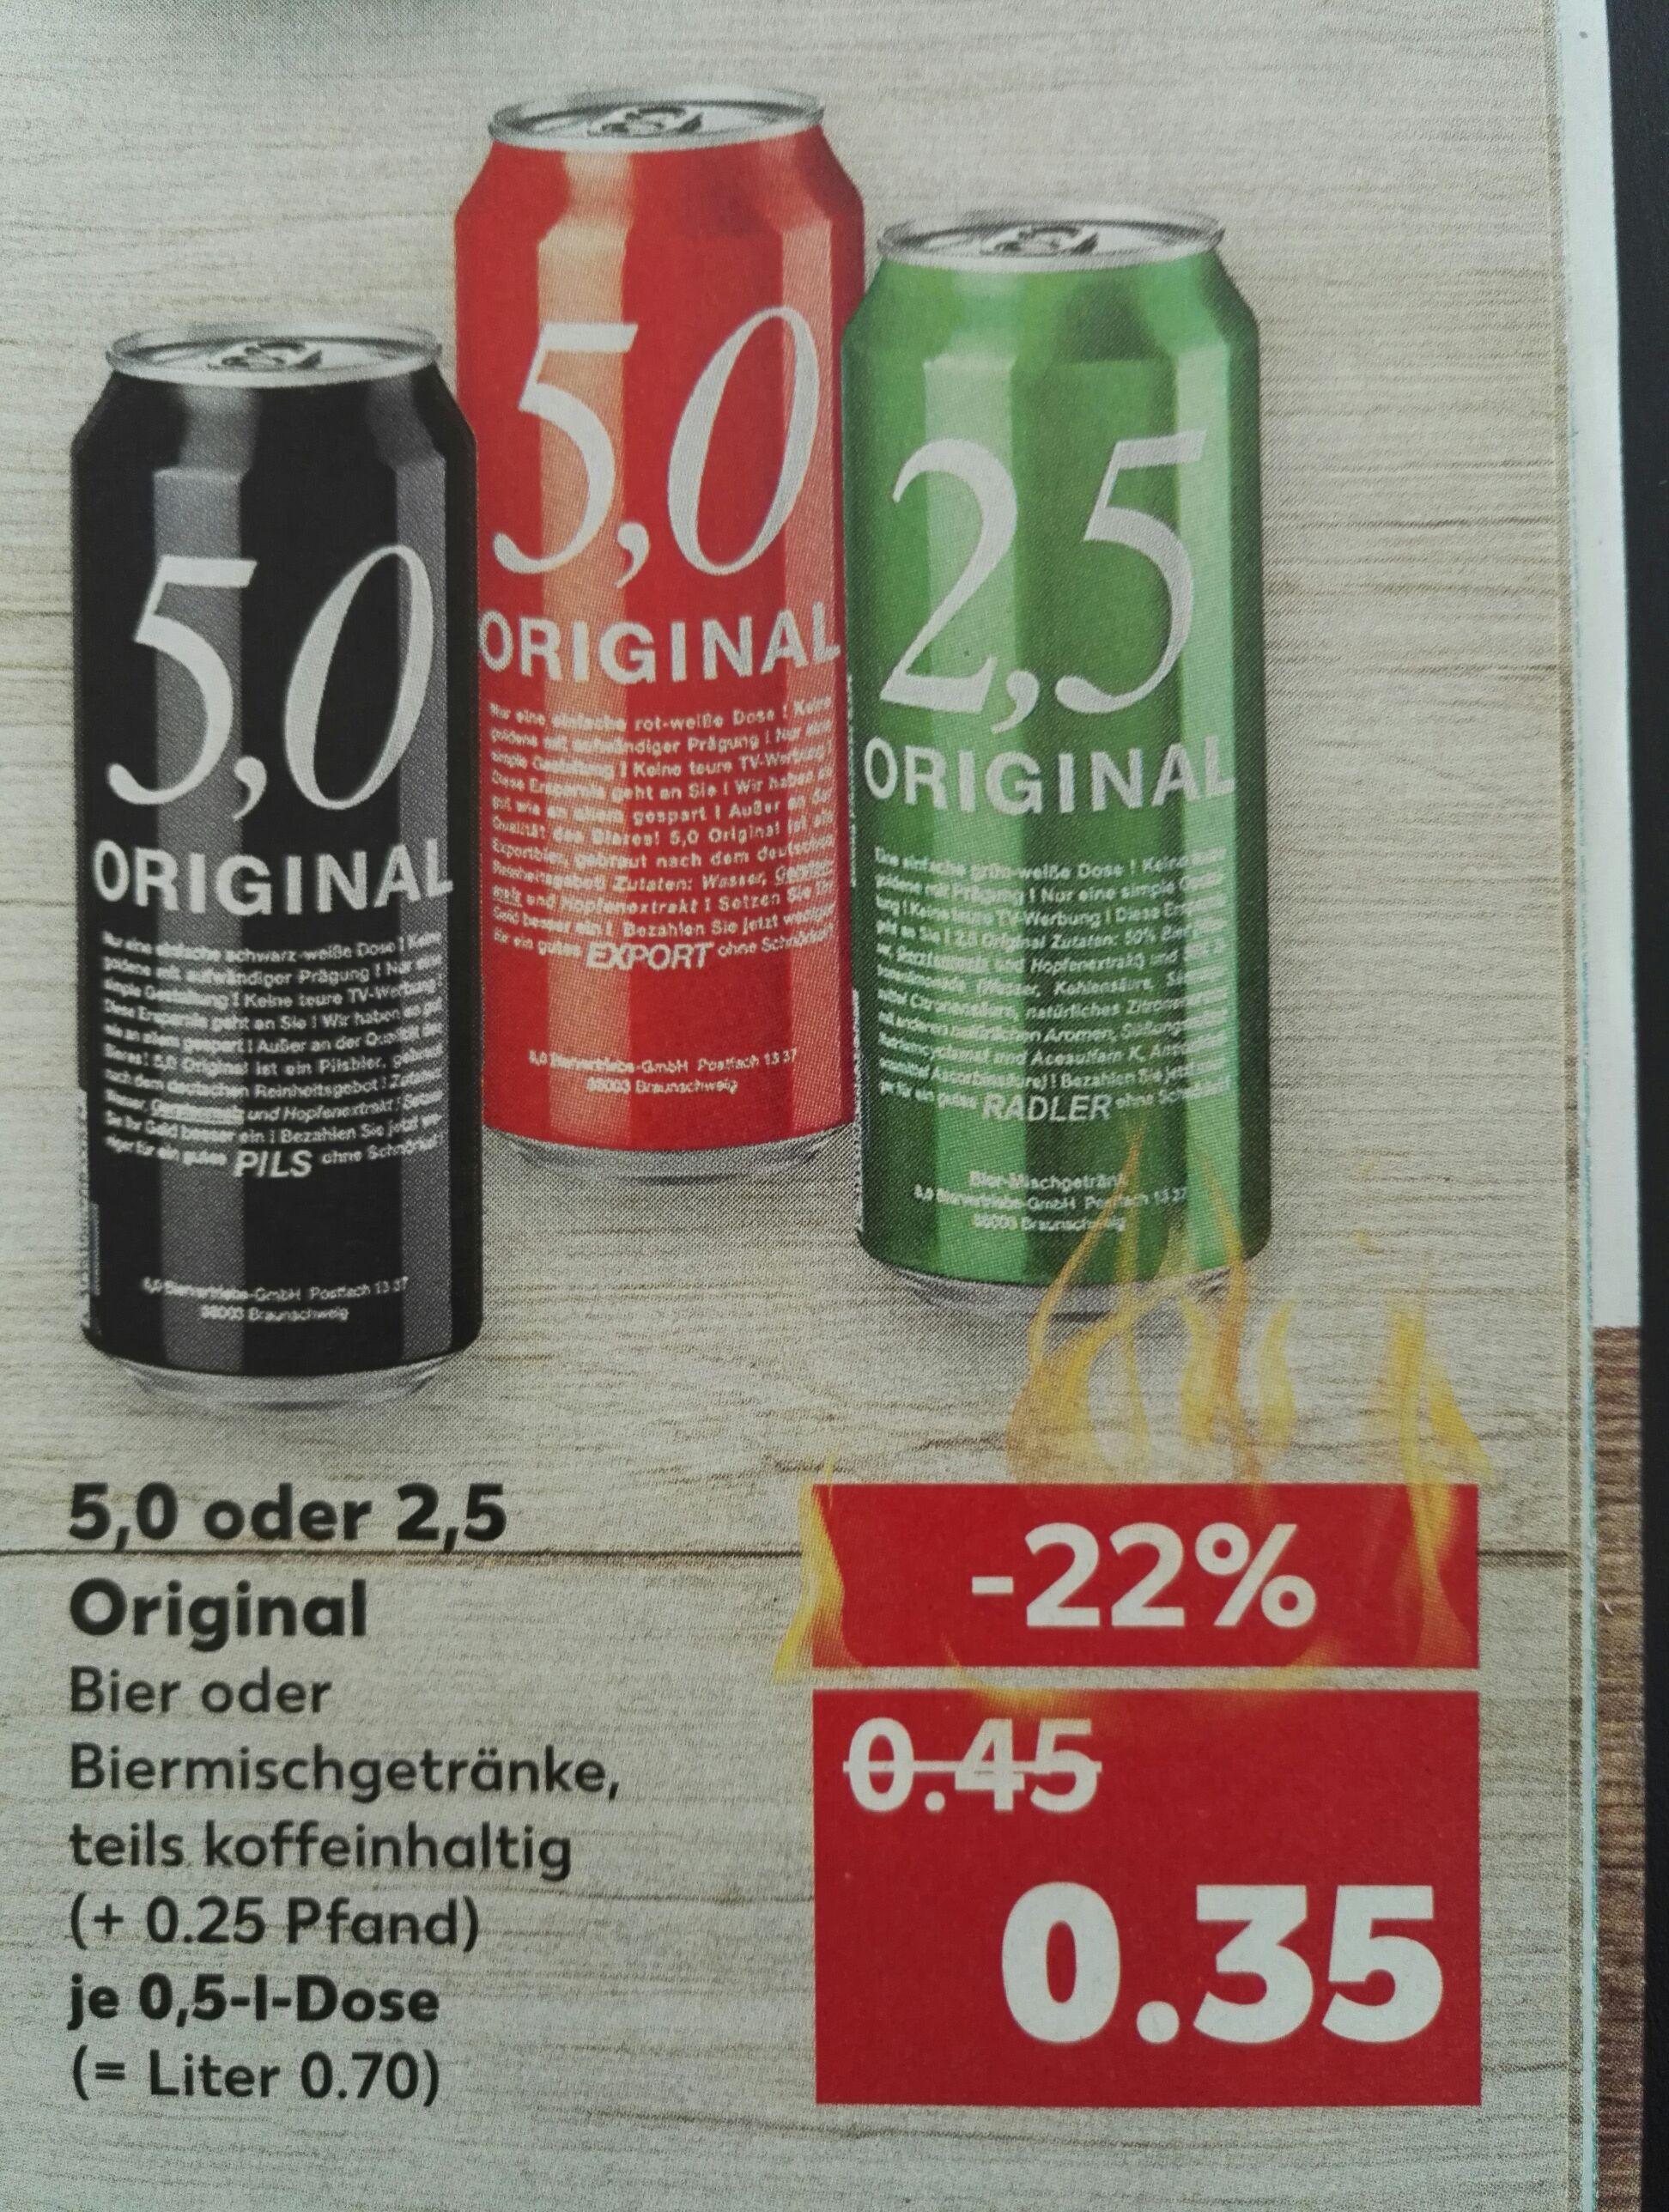 5,0 Original oder 2,5 original Dosenbier bei Kaufland (*Lokal?*)